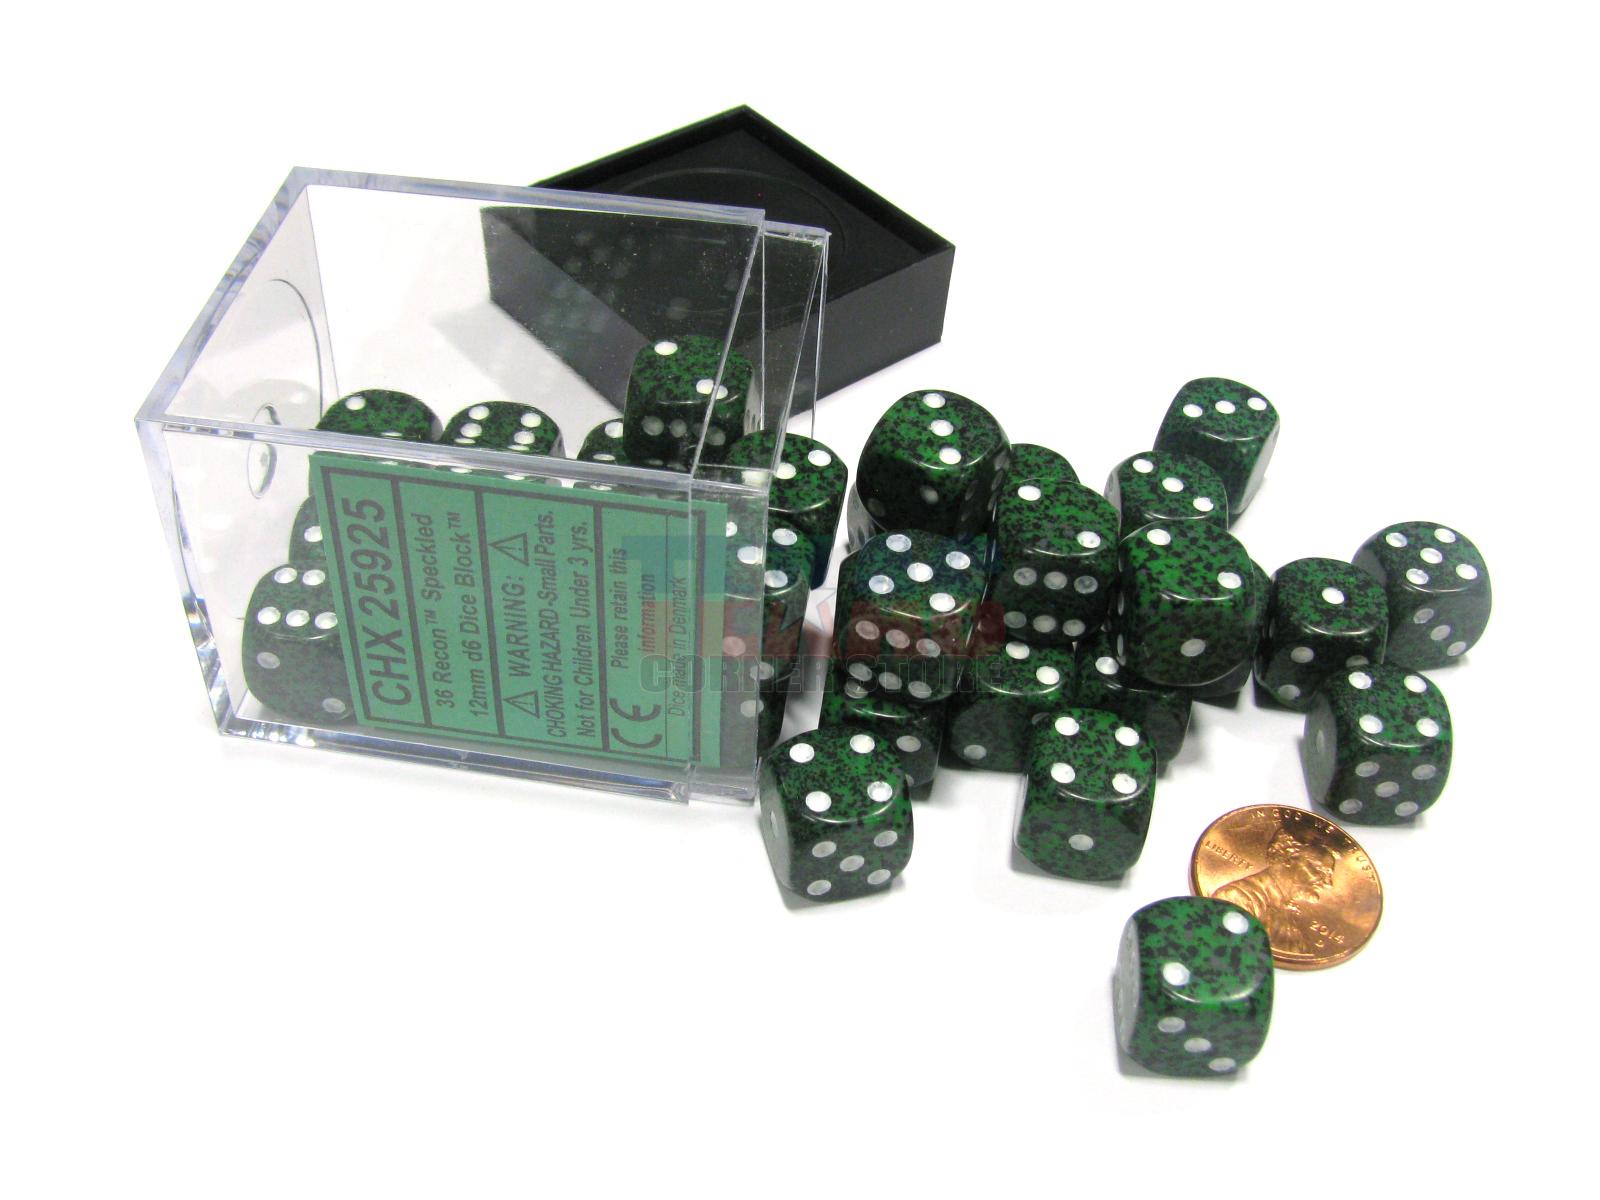 Chessex Speckled 12mm dice set Granite 36 pieces dice set